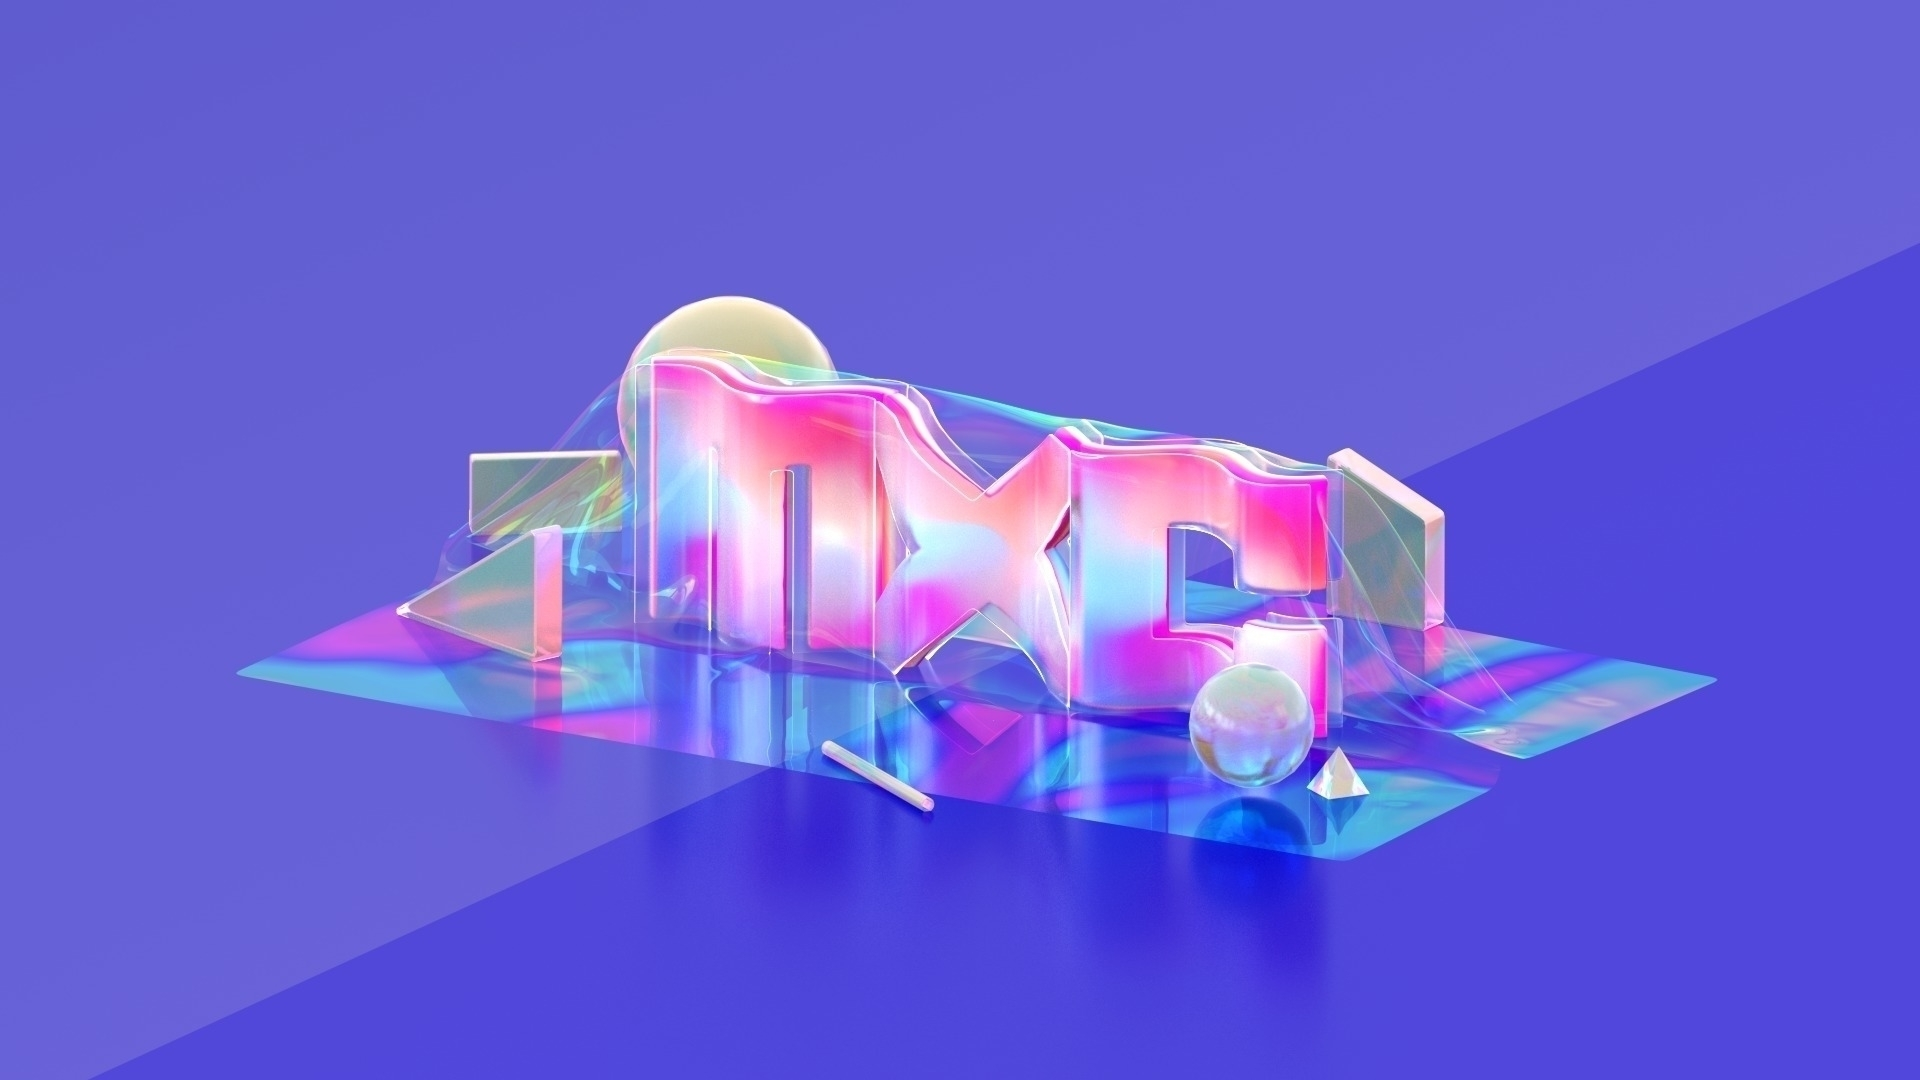 Gradient. xxxxxxxxx - design, digitalart - mxcstudio | ello